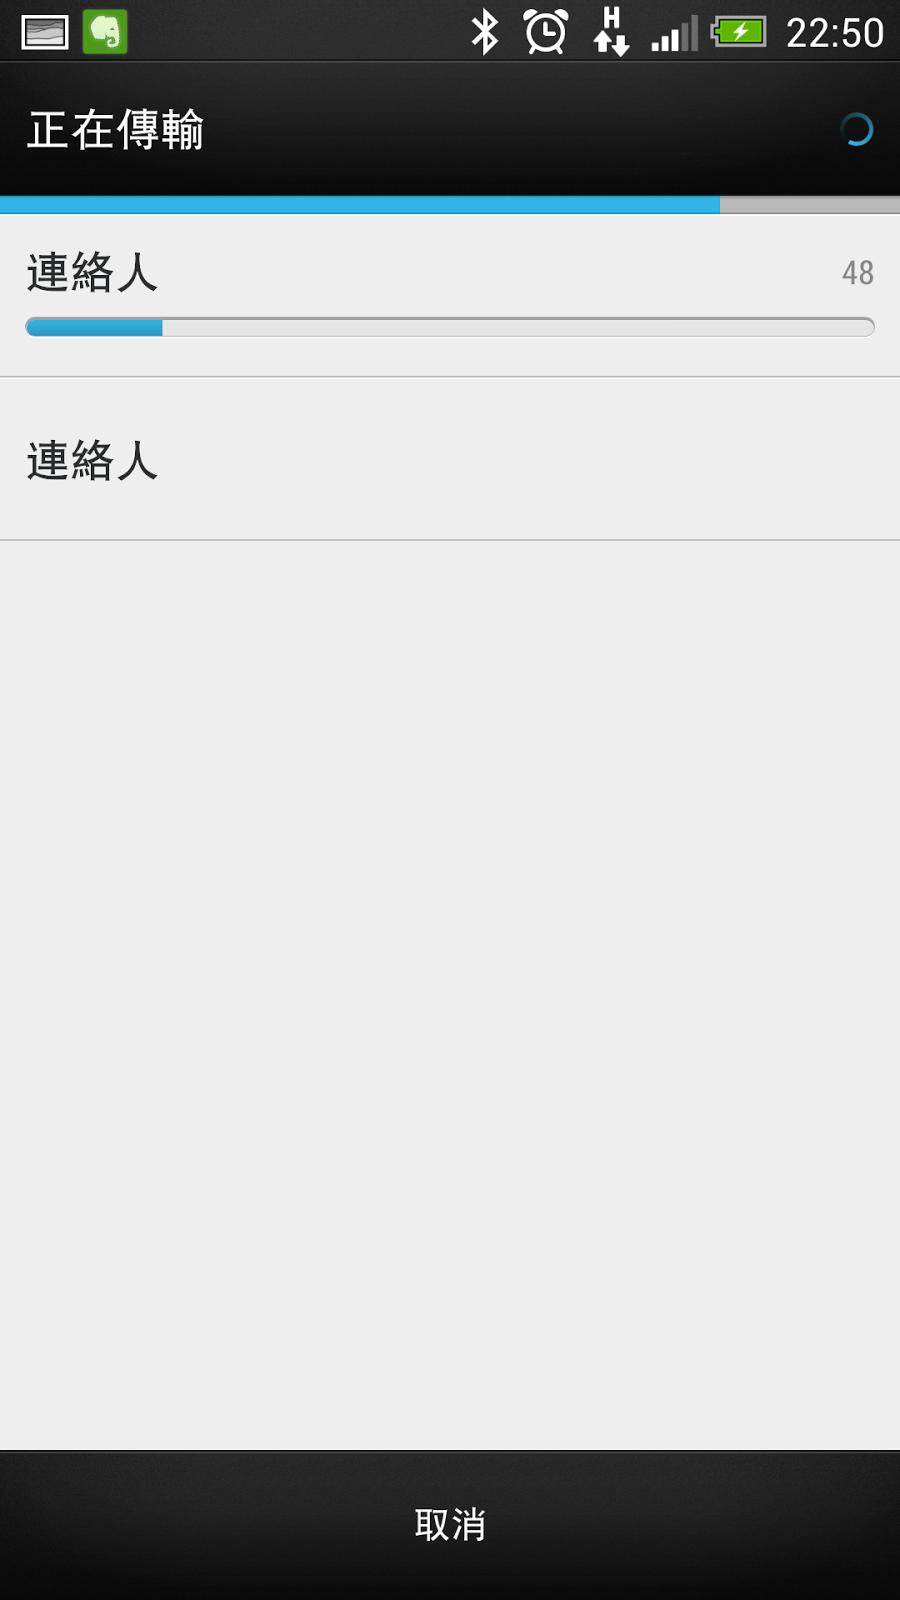 iPhone 5 聯絡人無痛轉移到 NEW HTC ONE 教學